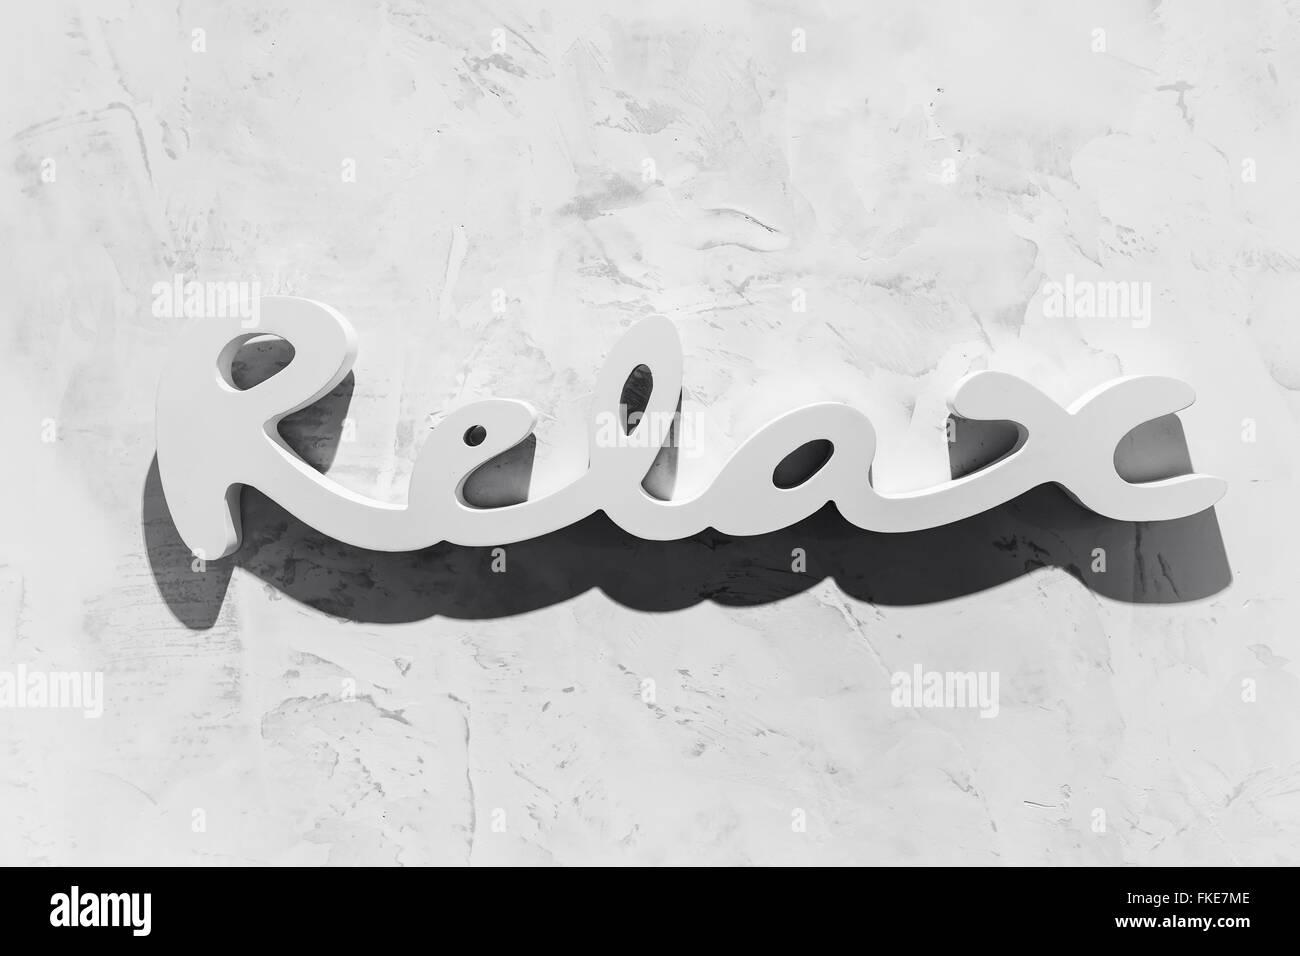 "The word ""RELAX"" written in wooden letterpress type. Stock Photo"